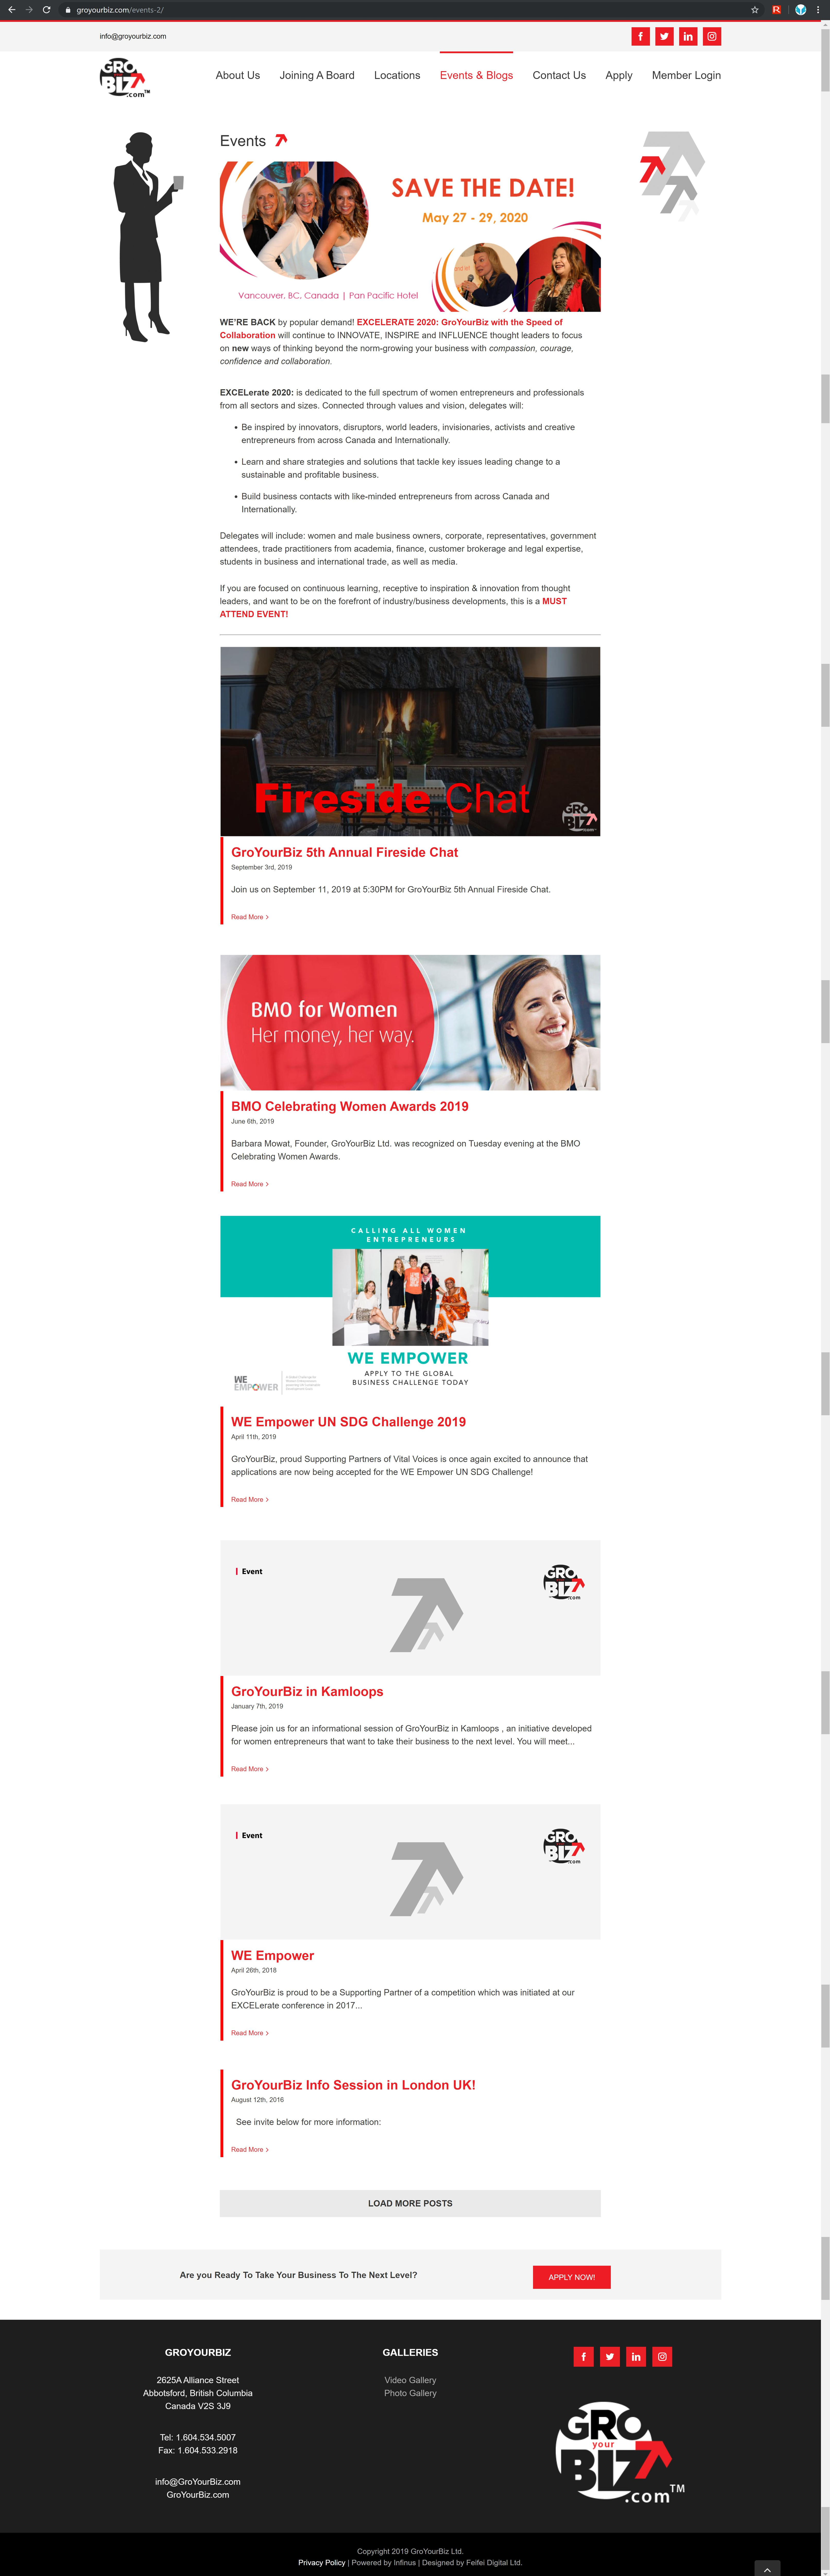 GroYourBiz Events Page | User Interface and Front End Development | Feifei Digital | Monika Szucs